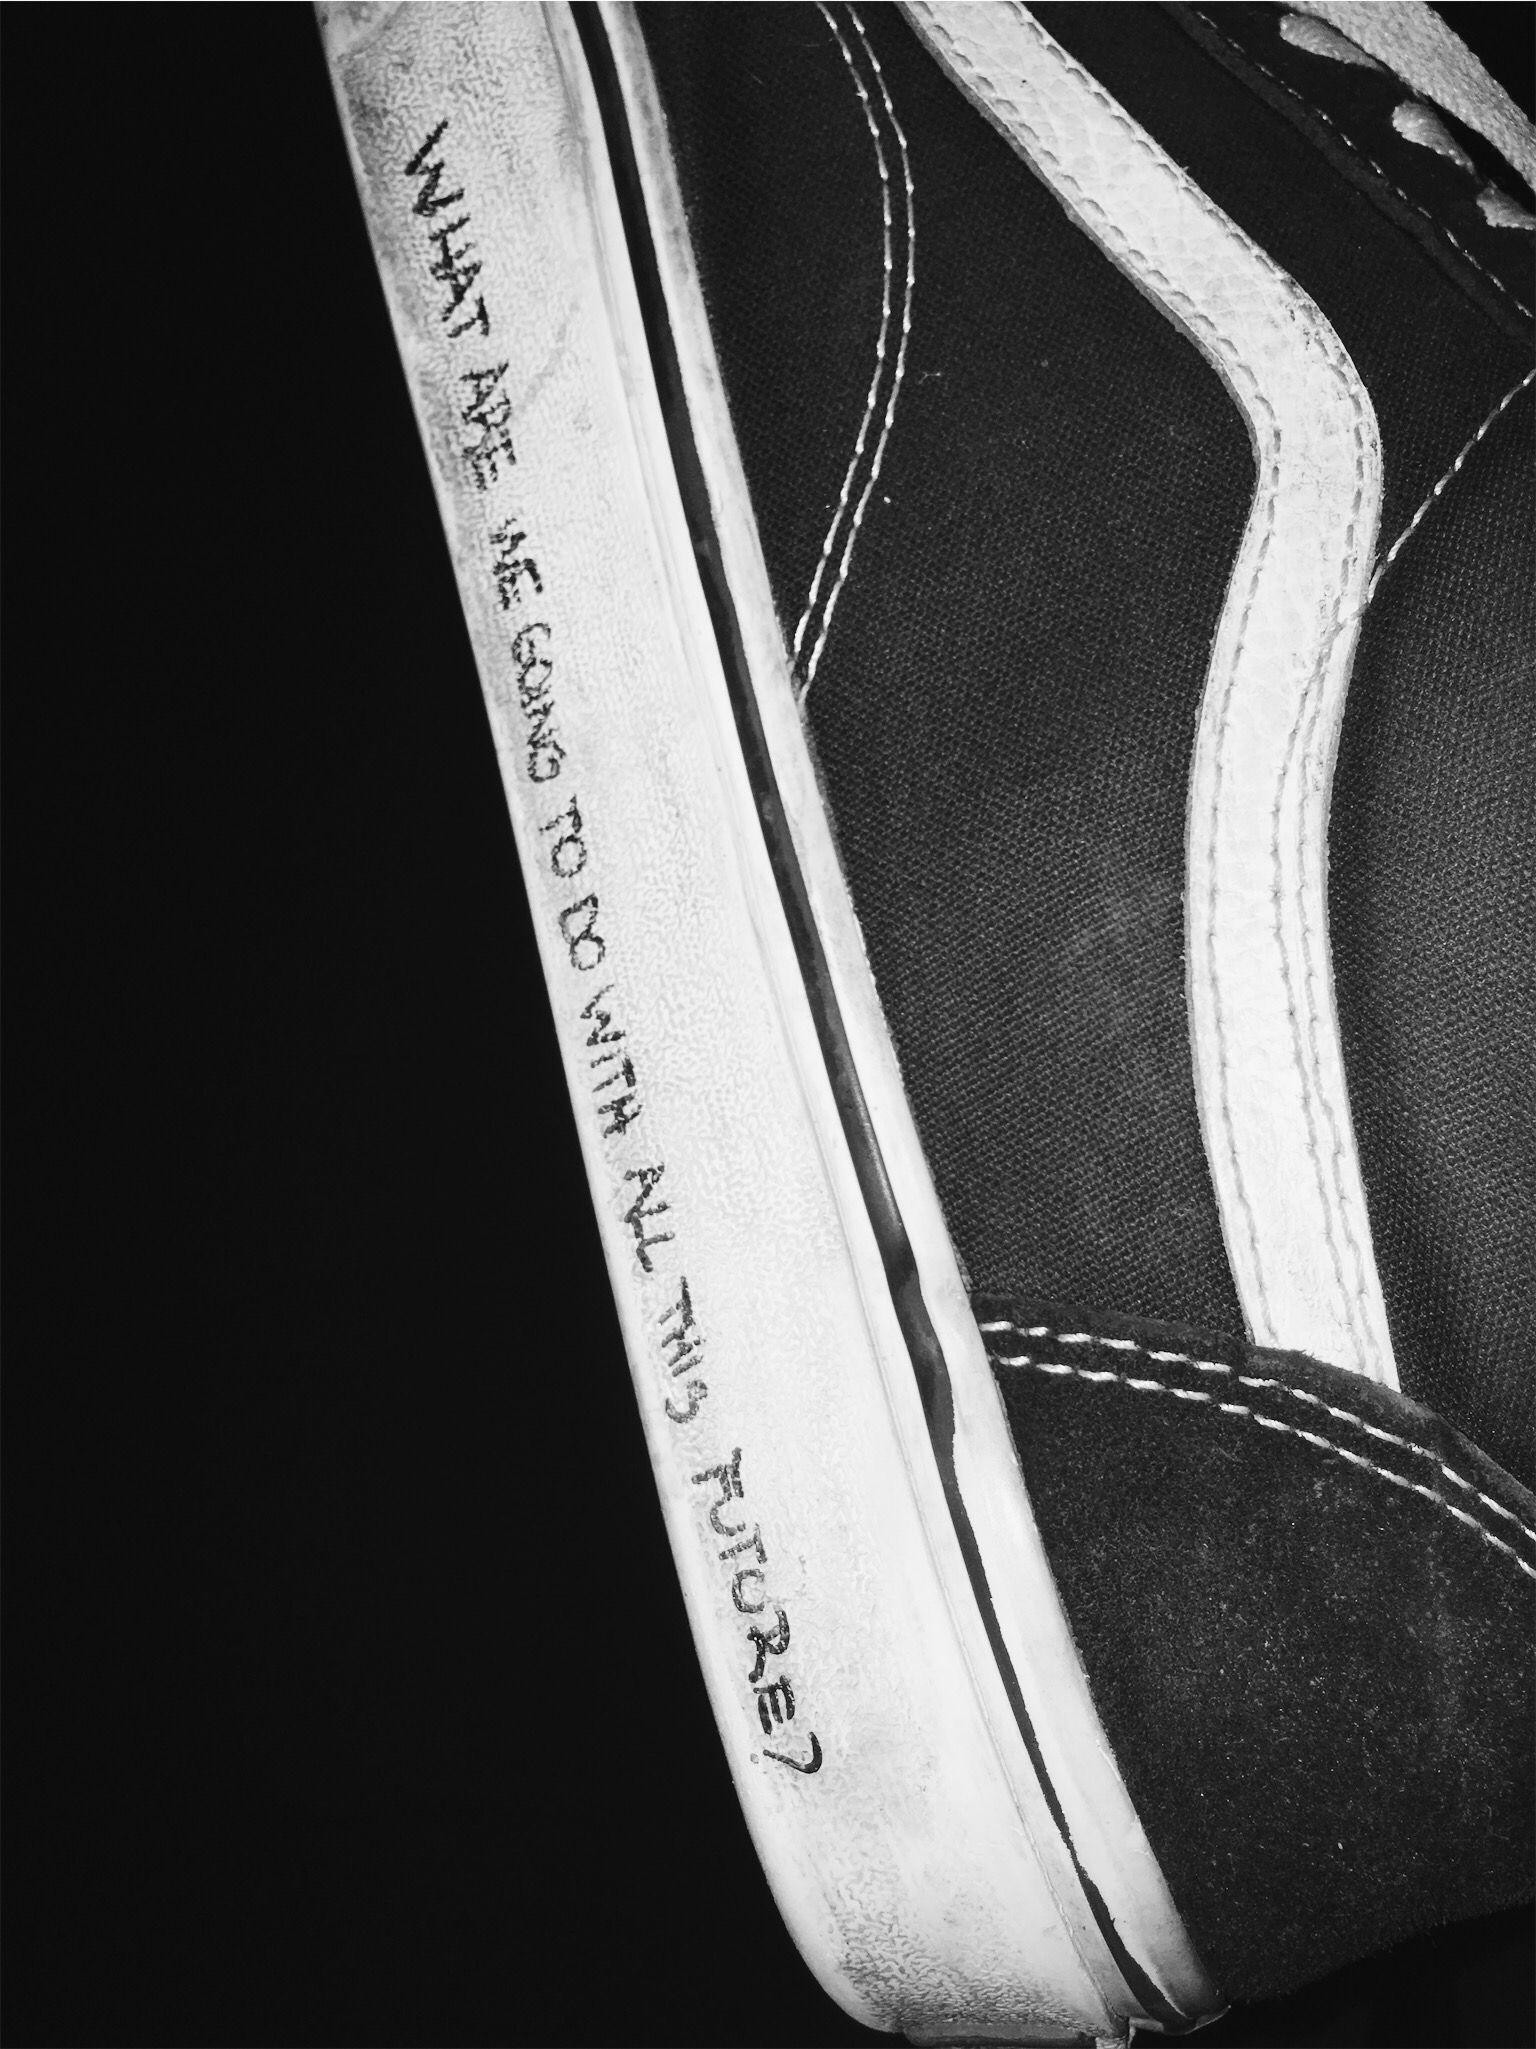 Gucci Vans Shoes Skate Gucci Shoes Source By Junecartershoes